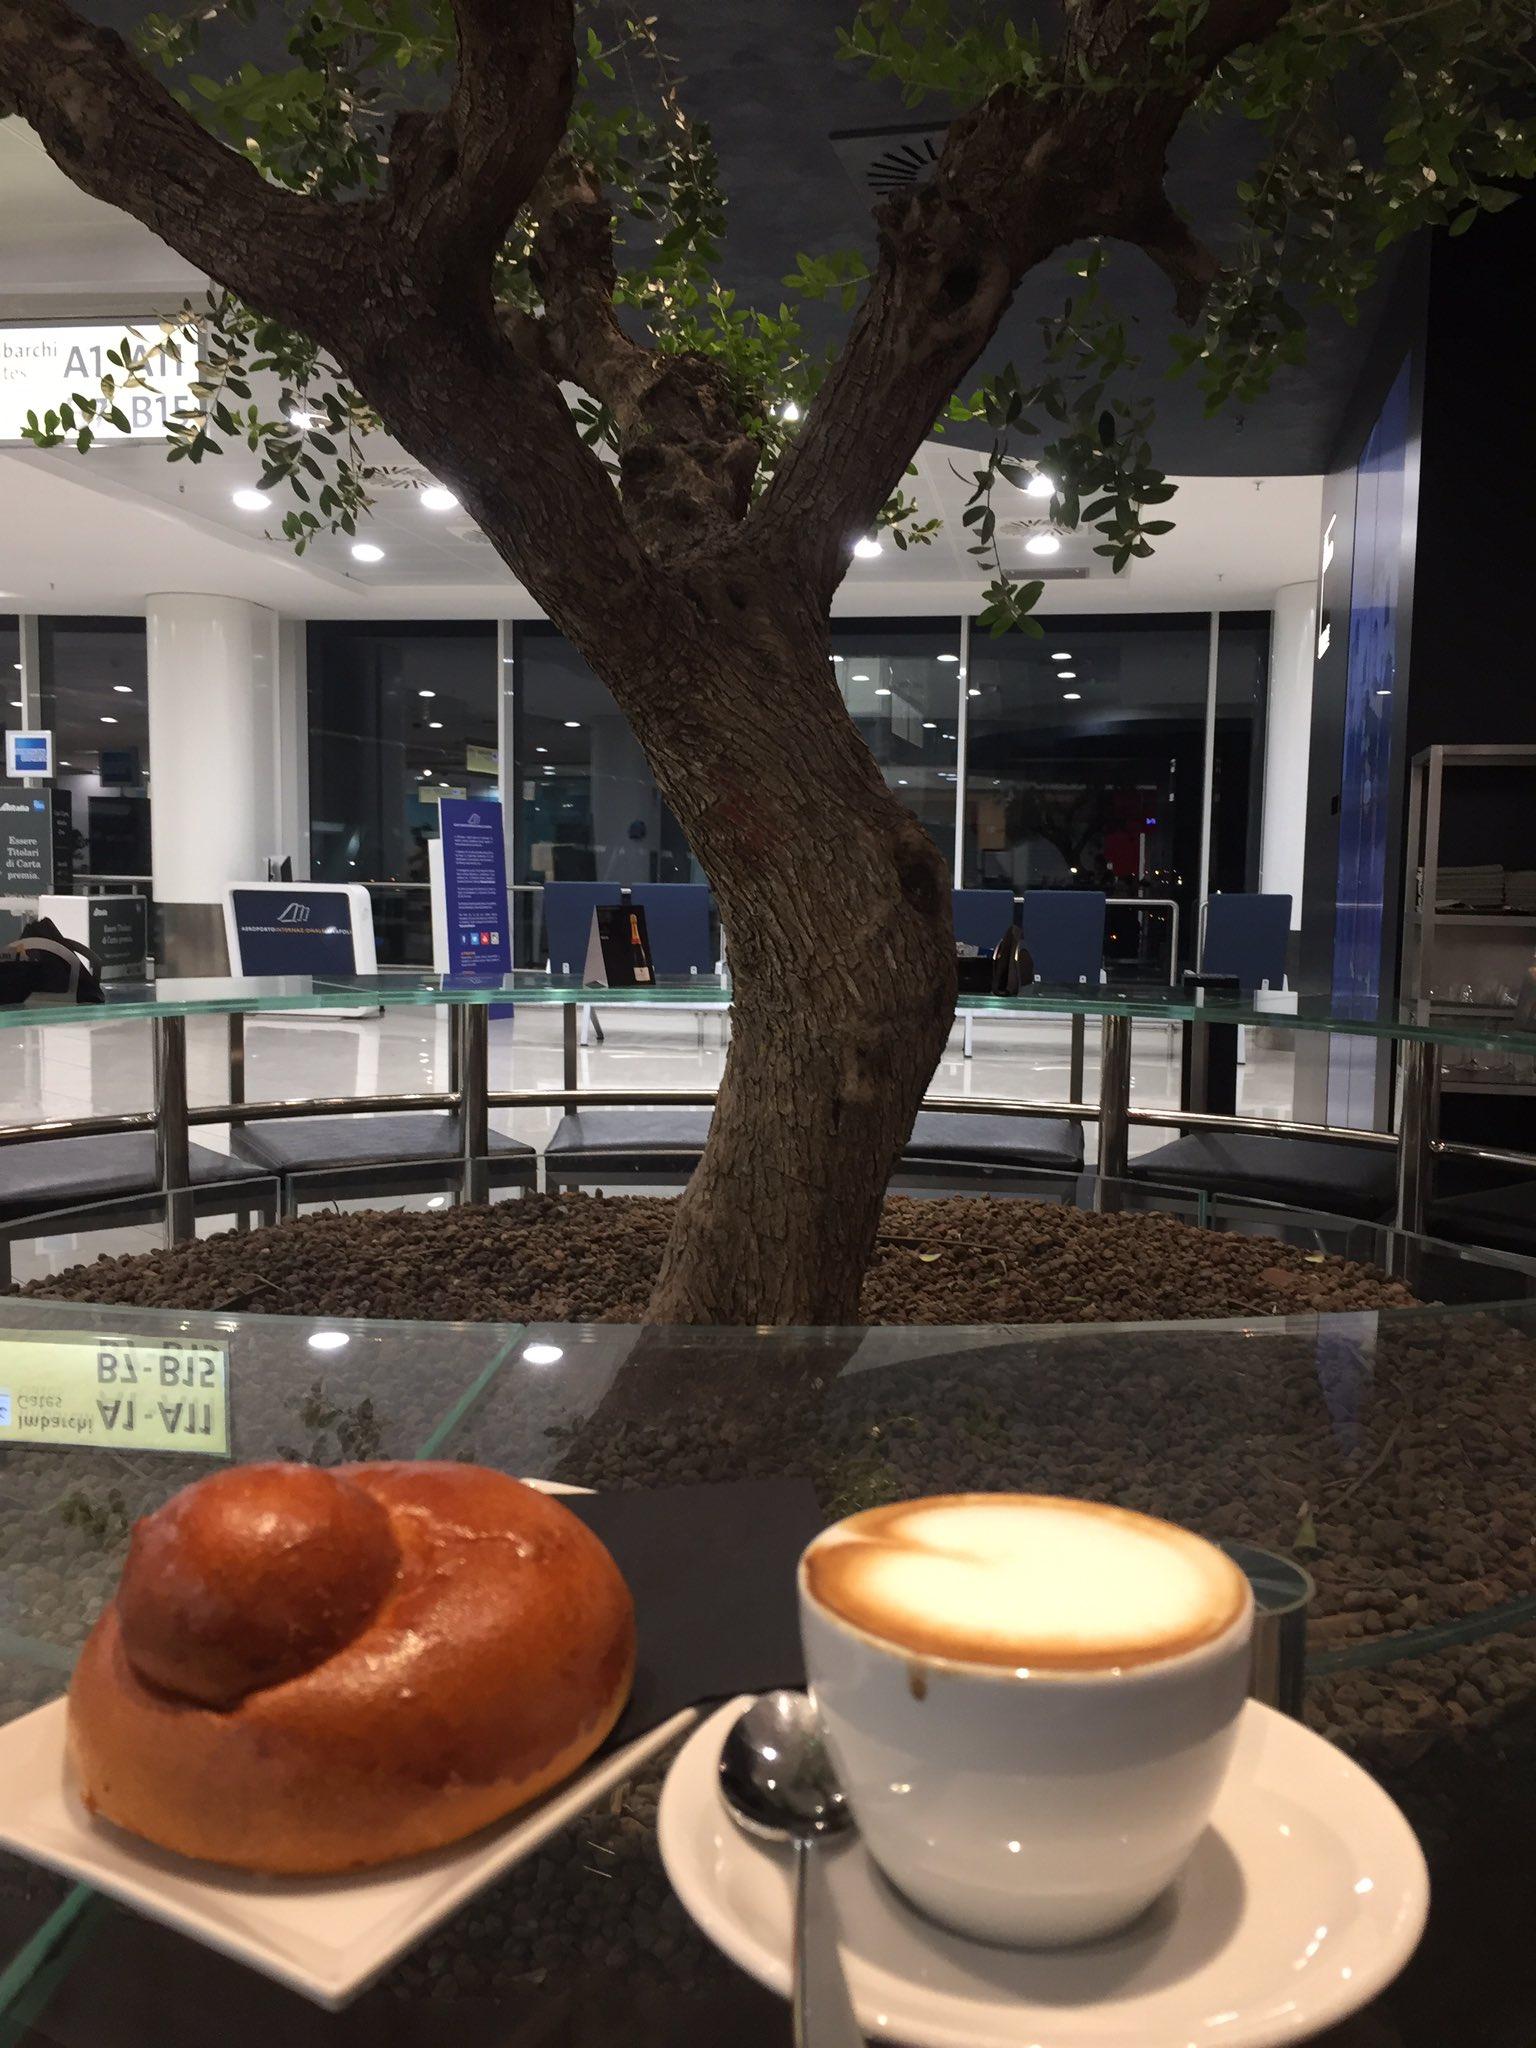 #departing breakfasts #travel4science #AllSTEMScientix https://t.co/zpFZkcUgKN